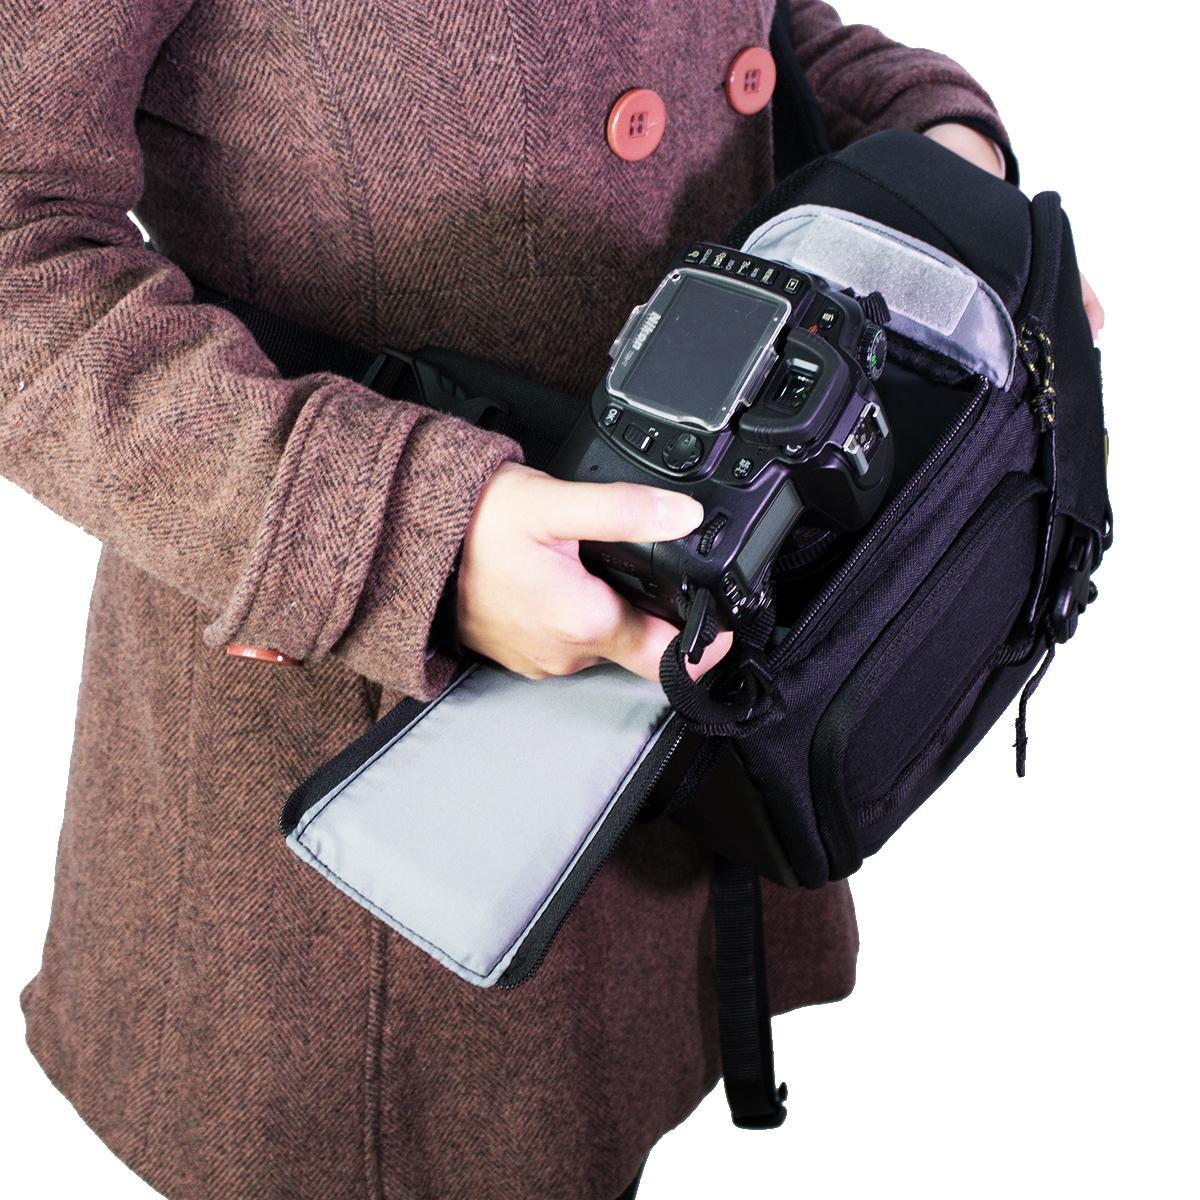 Mochila Vanguard Biin 37 para Equipamentos Fotográficos   - Fotolux